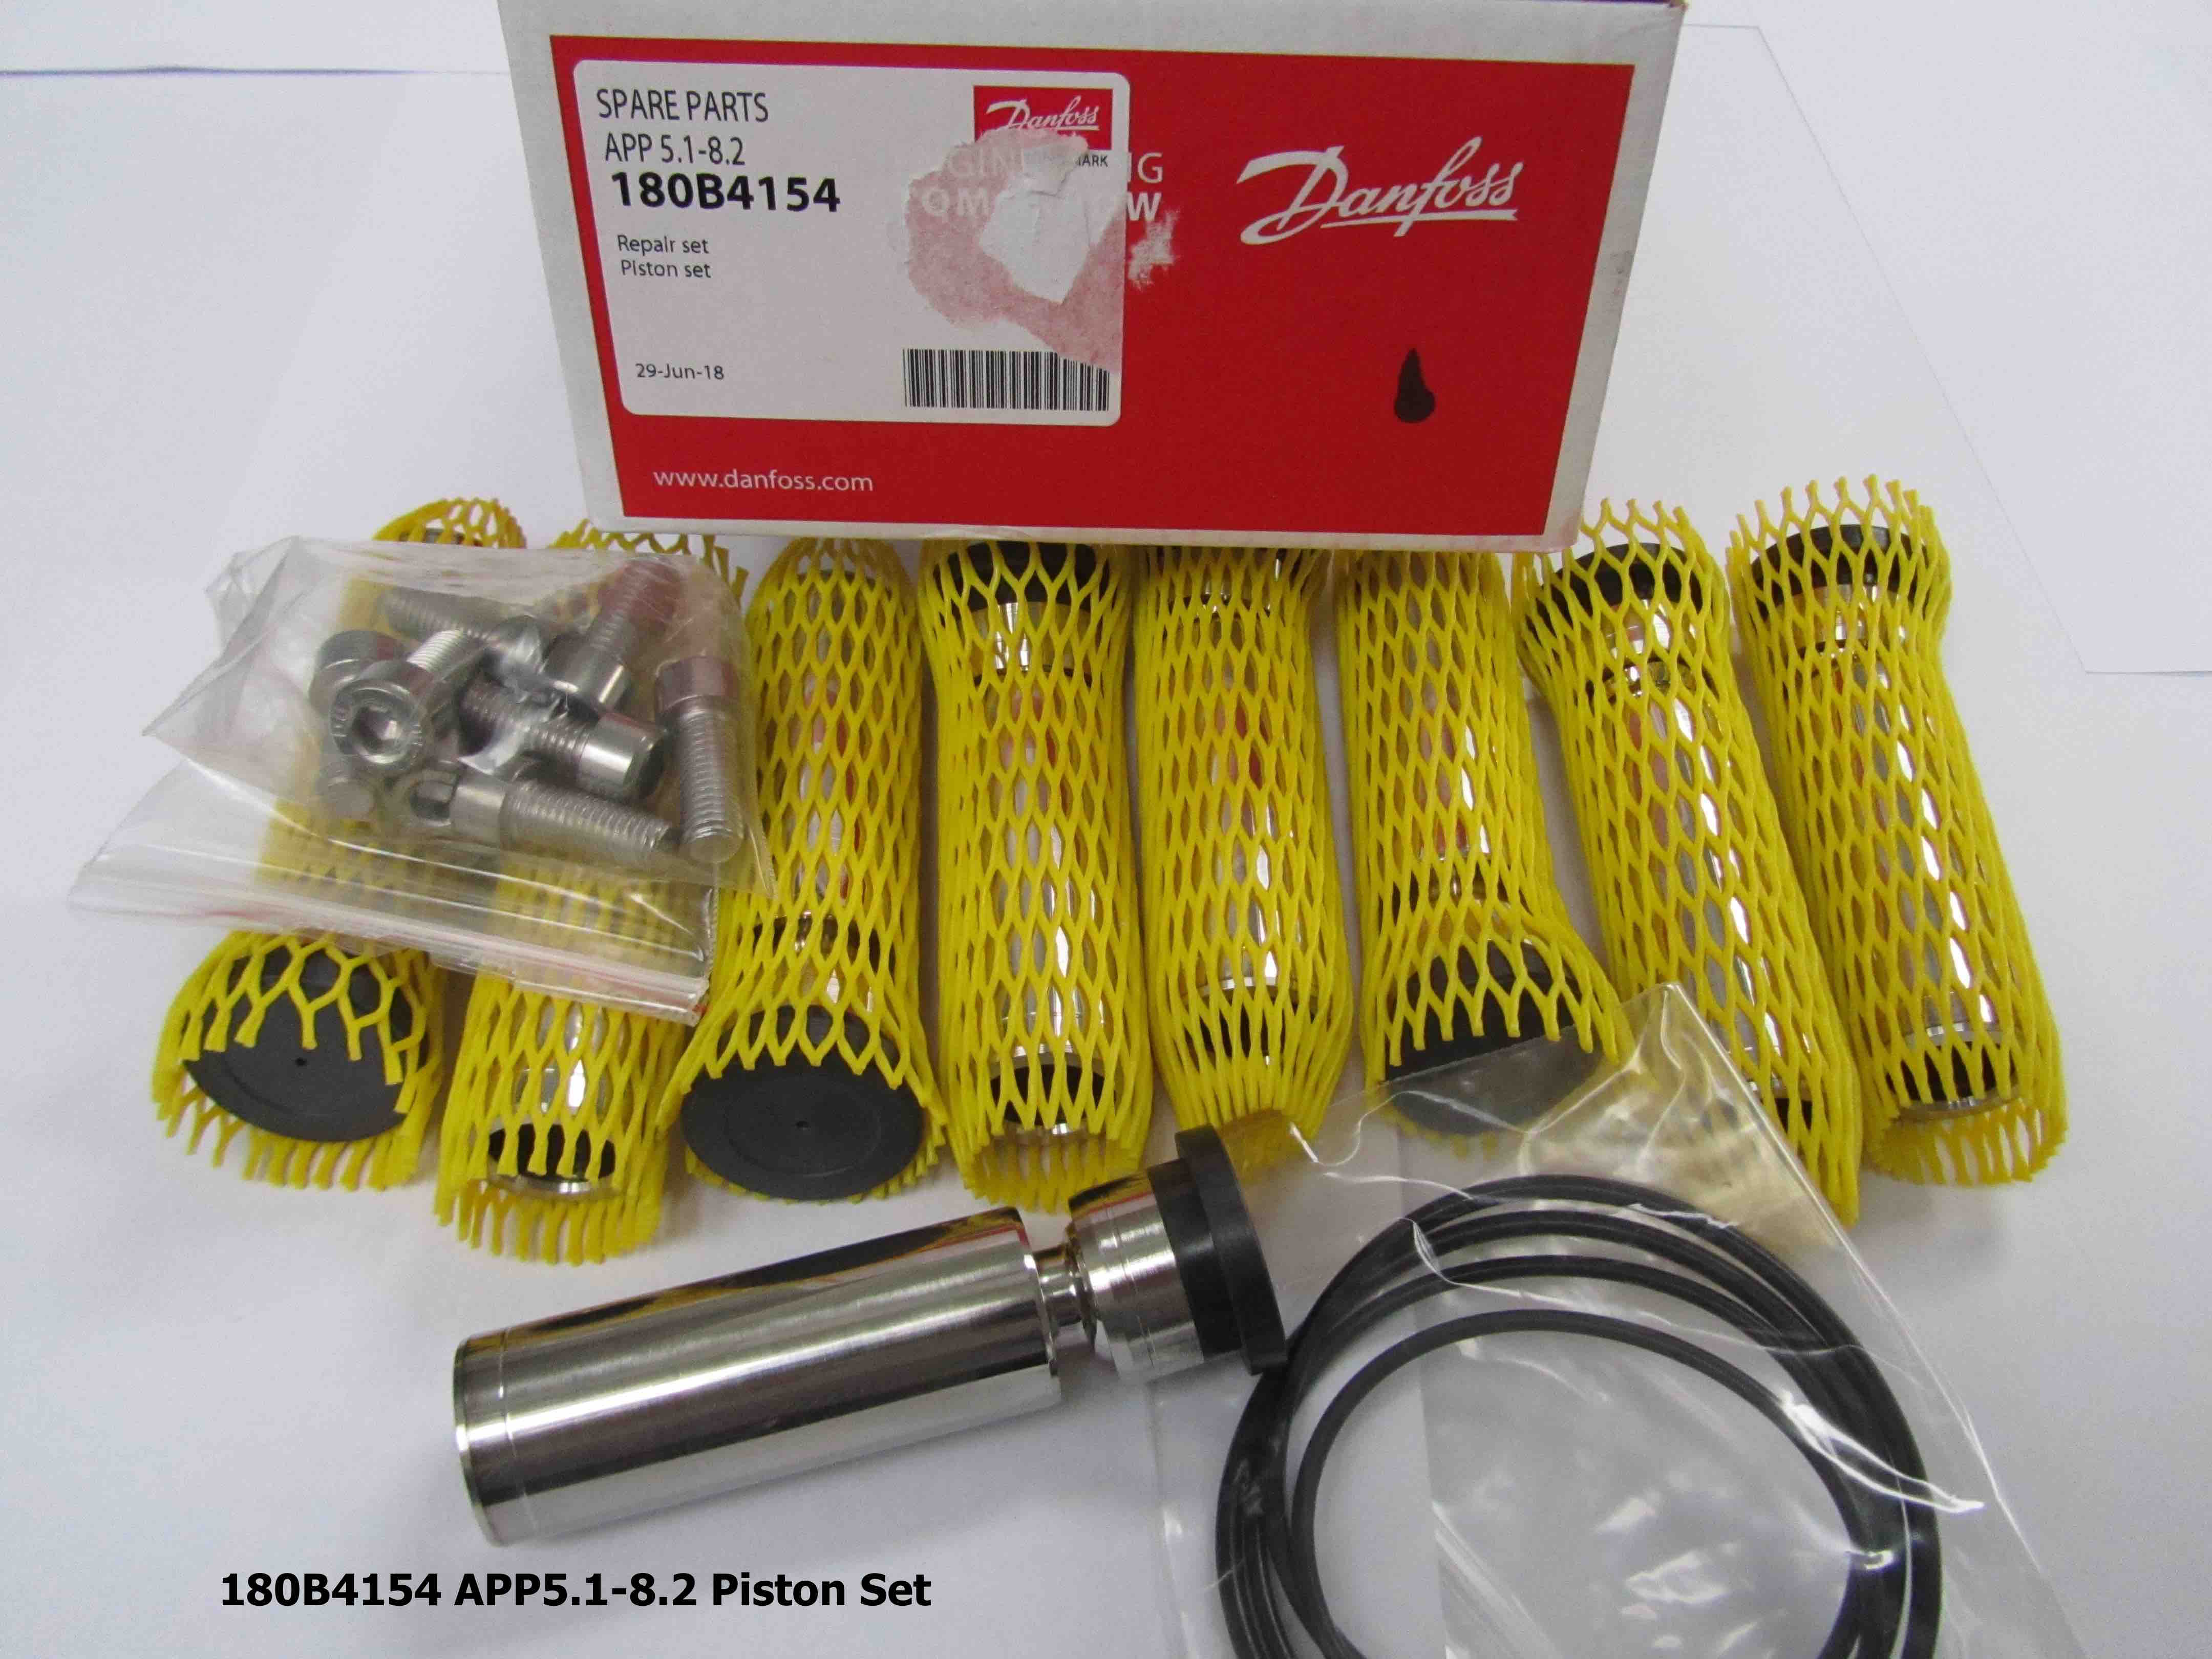 180B4154 APP5.1-8.2 Piston Set